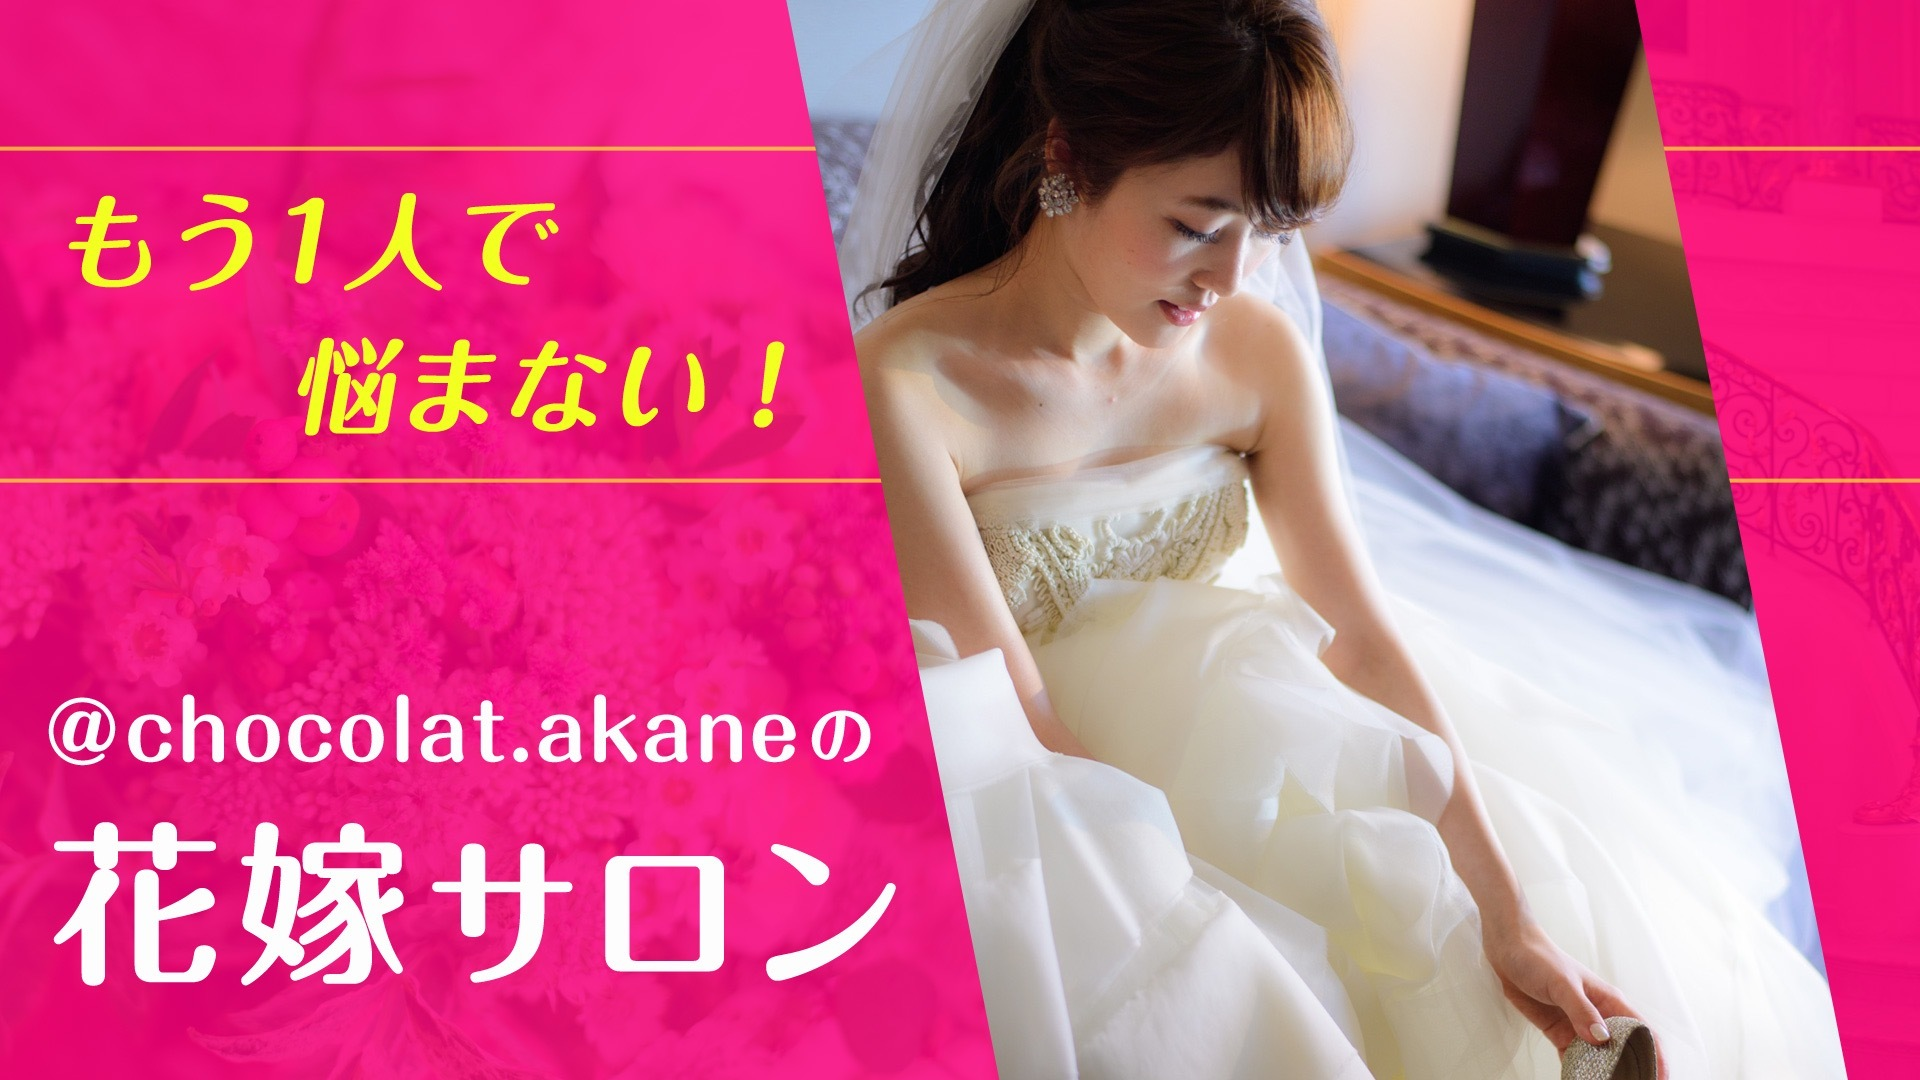 akane - もう1人で悩まない!花嫁サロン - DMM オンラインサロン